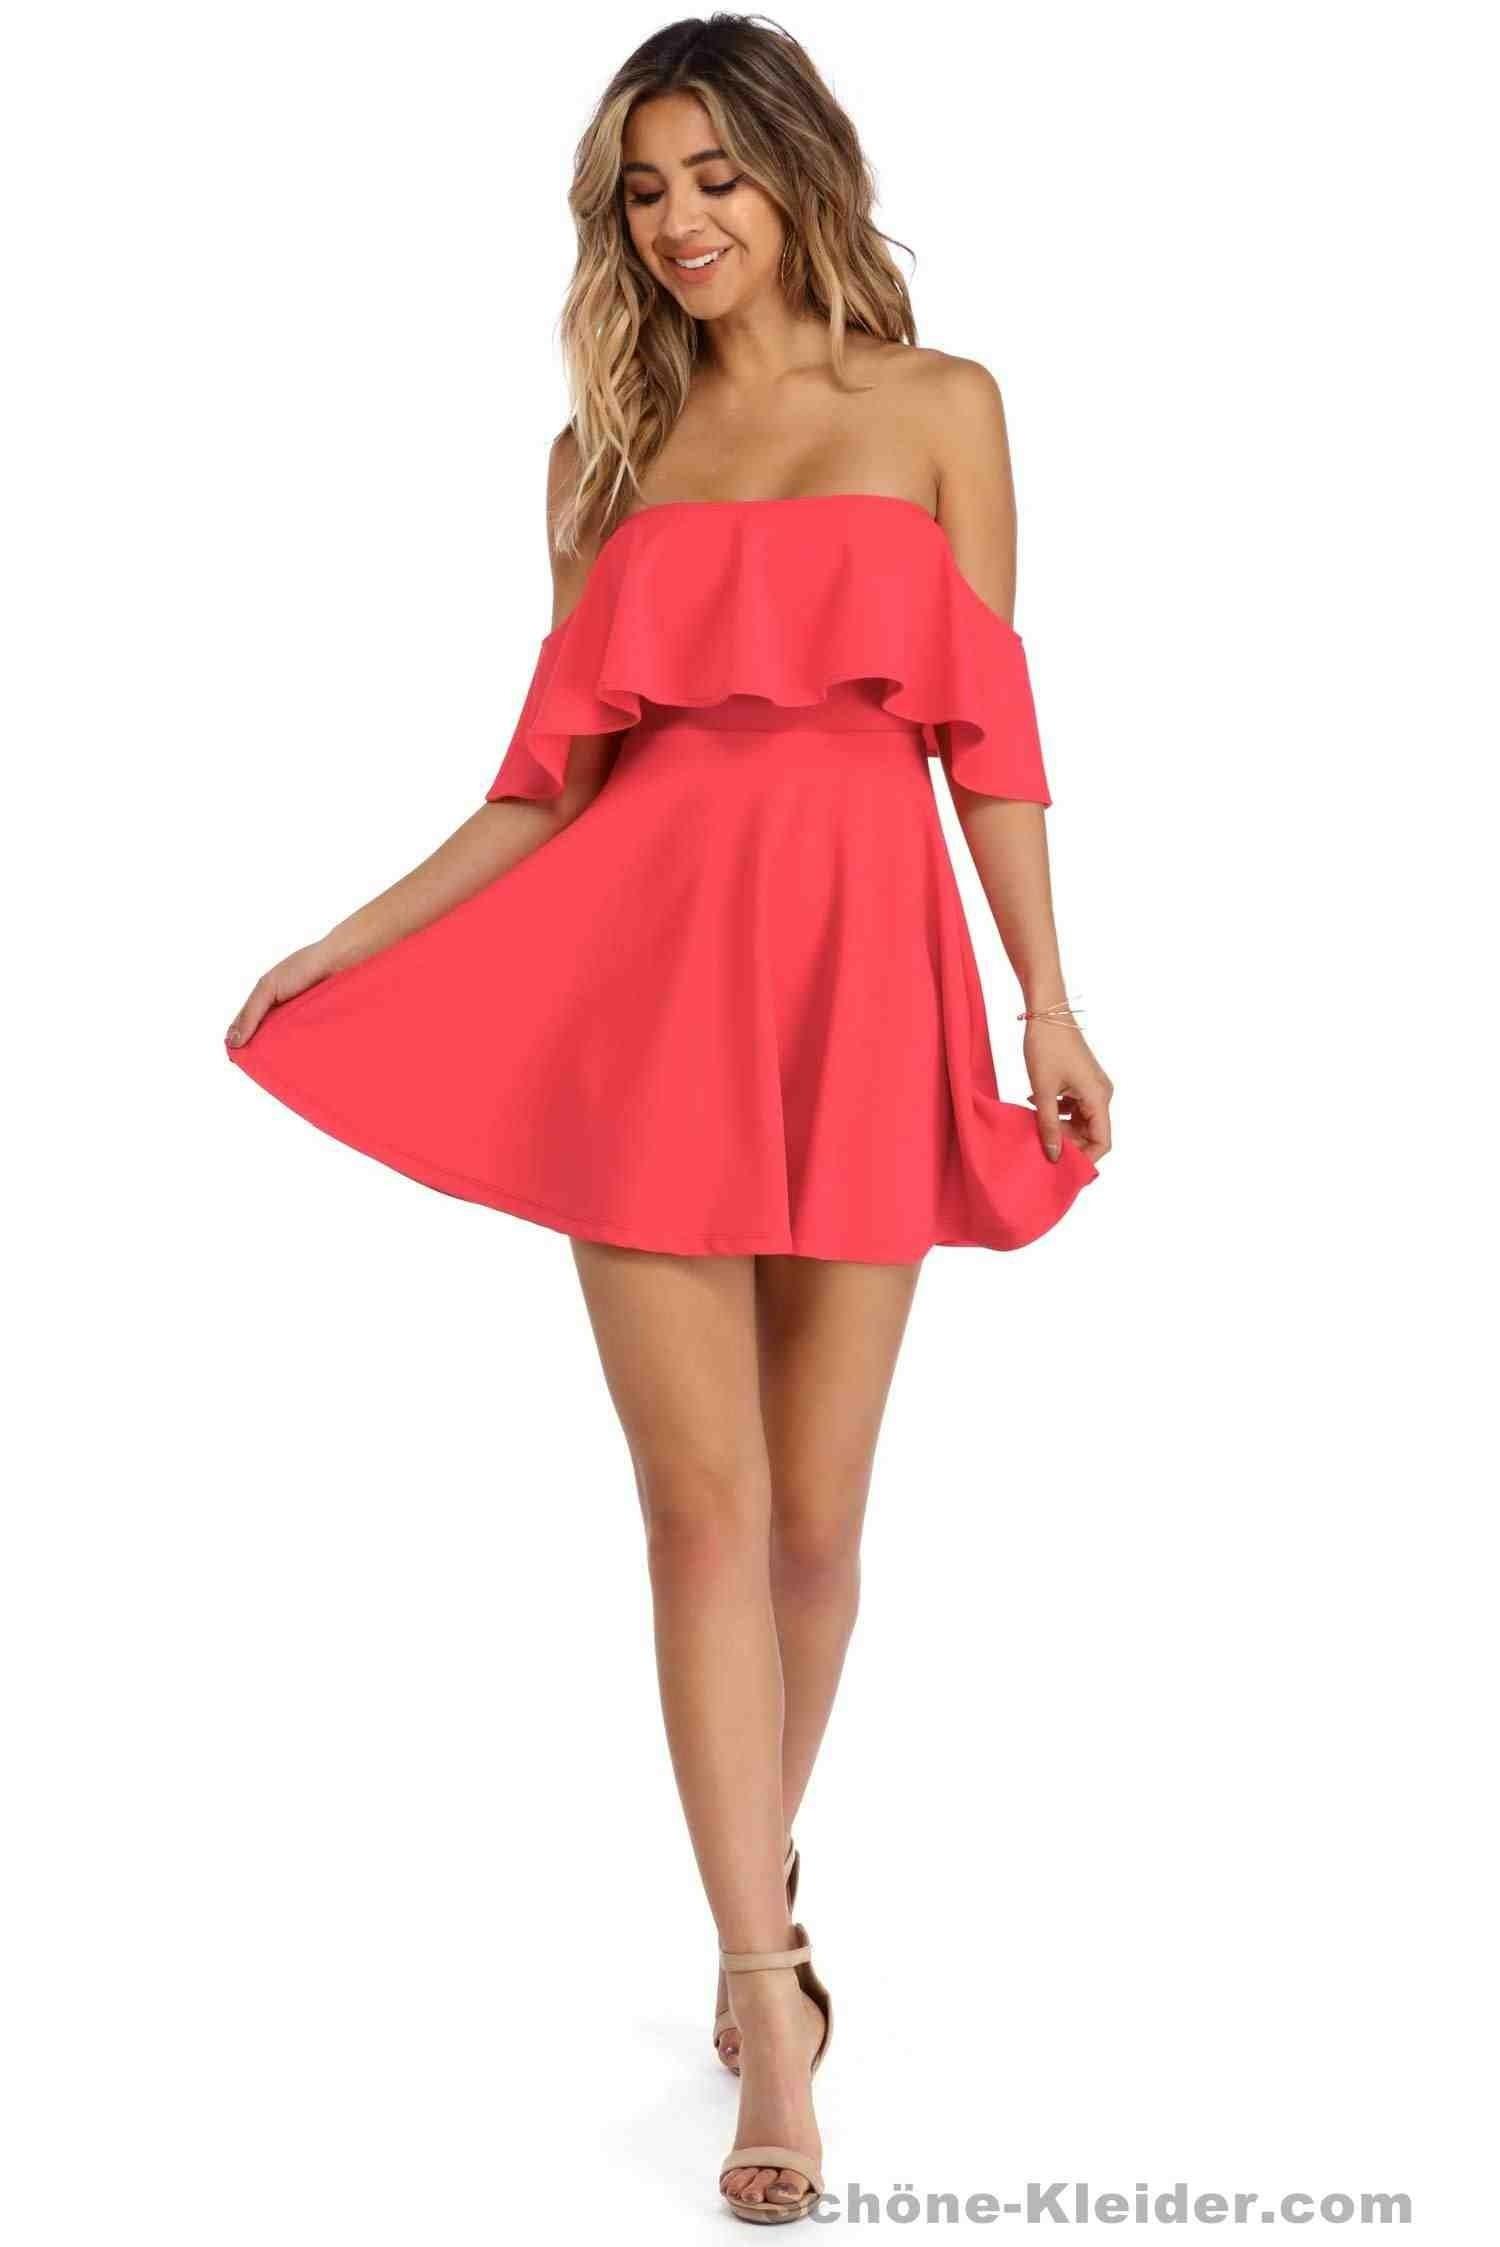 10 Perfekt Elegante Abendkleider Kurz Stylish13 Coolste Elegante Abendkleider Kurz Design